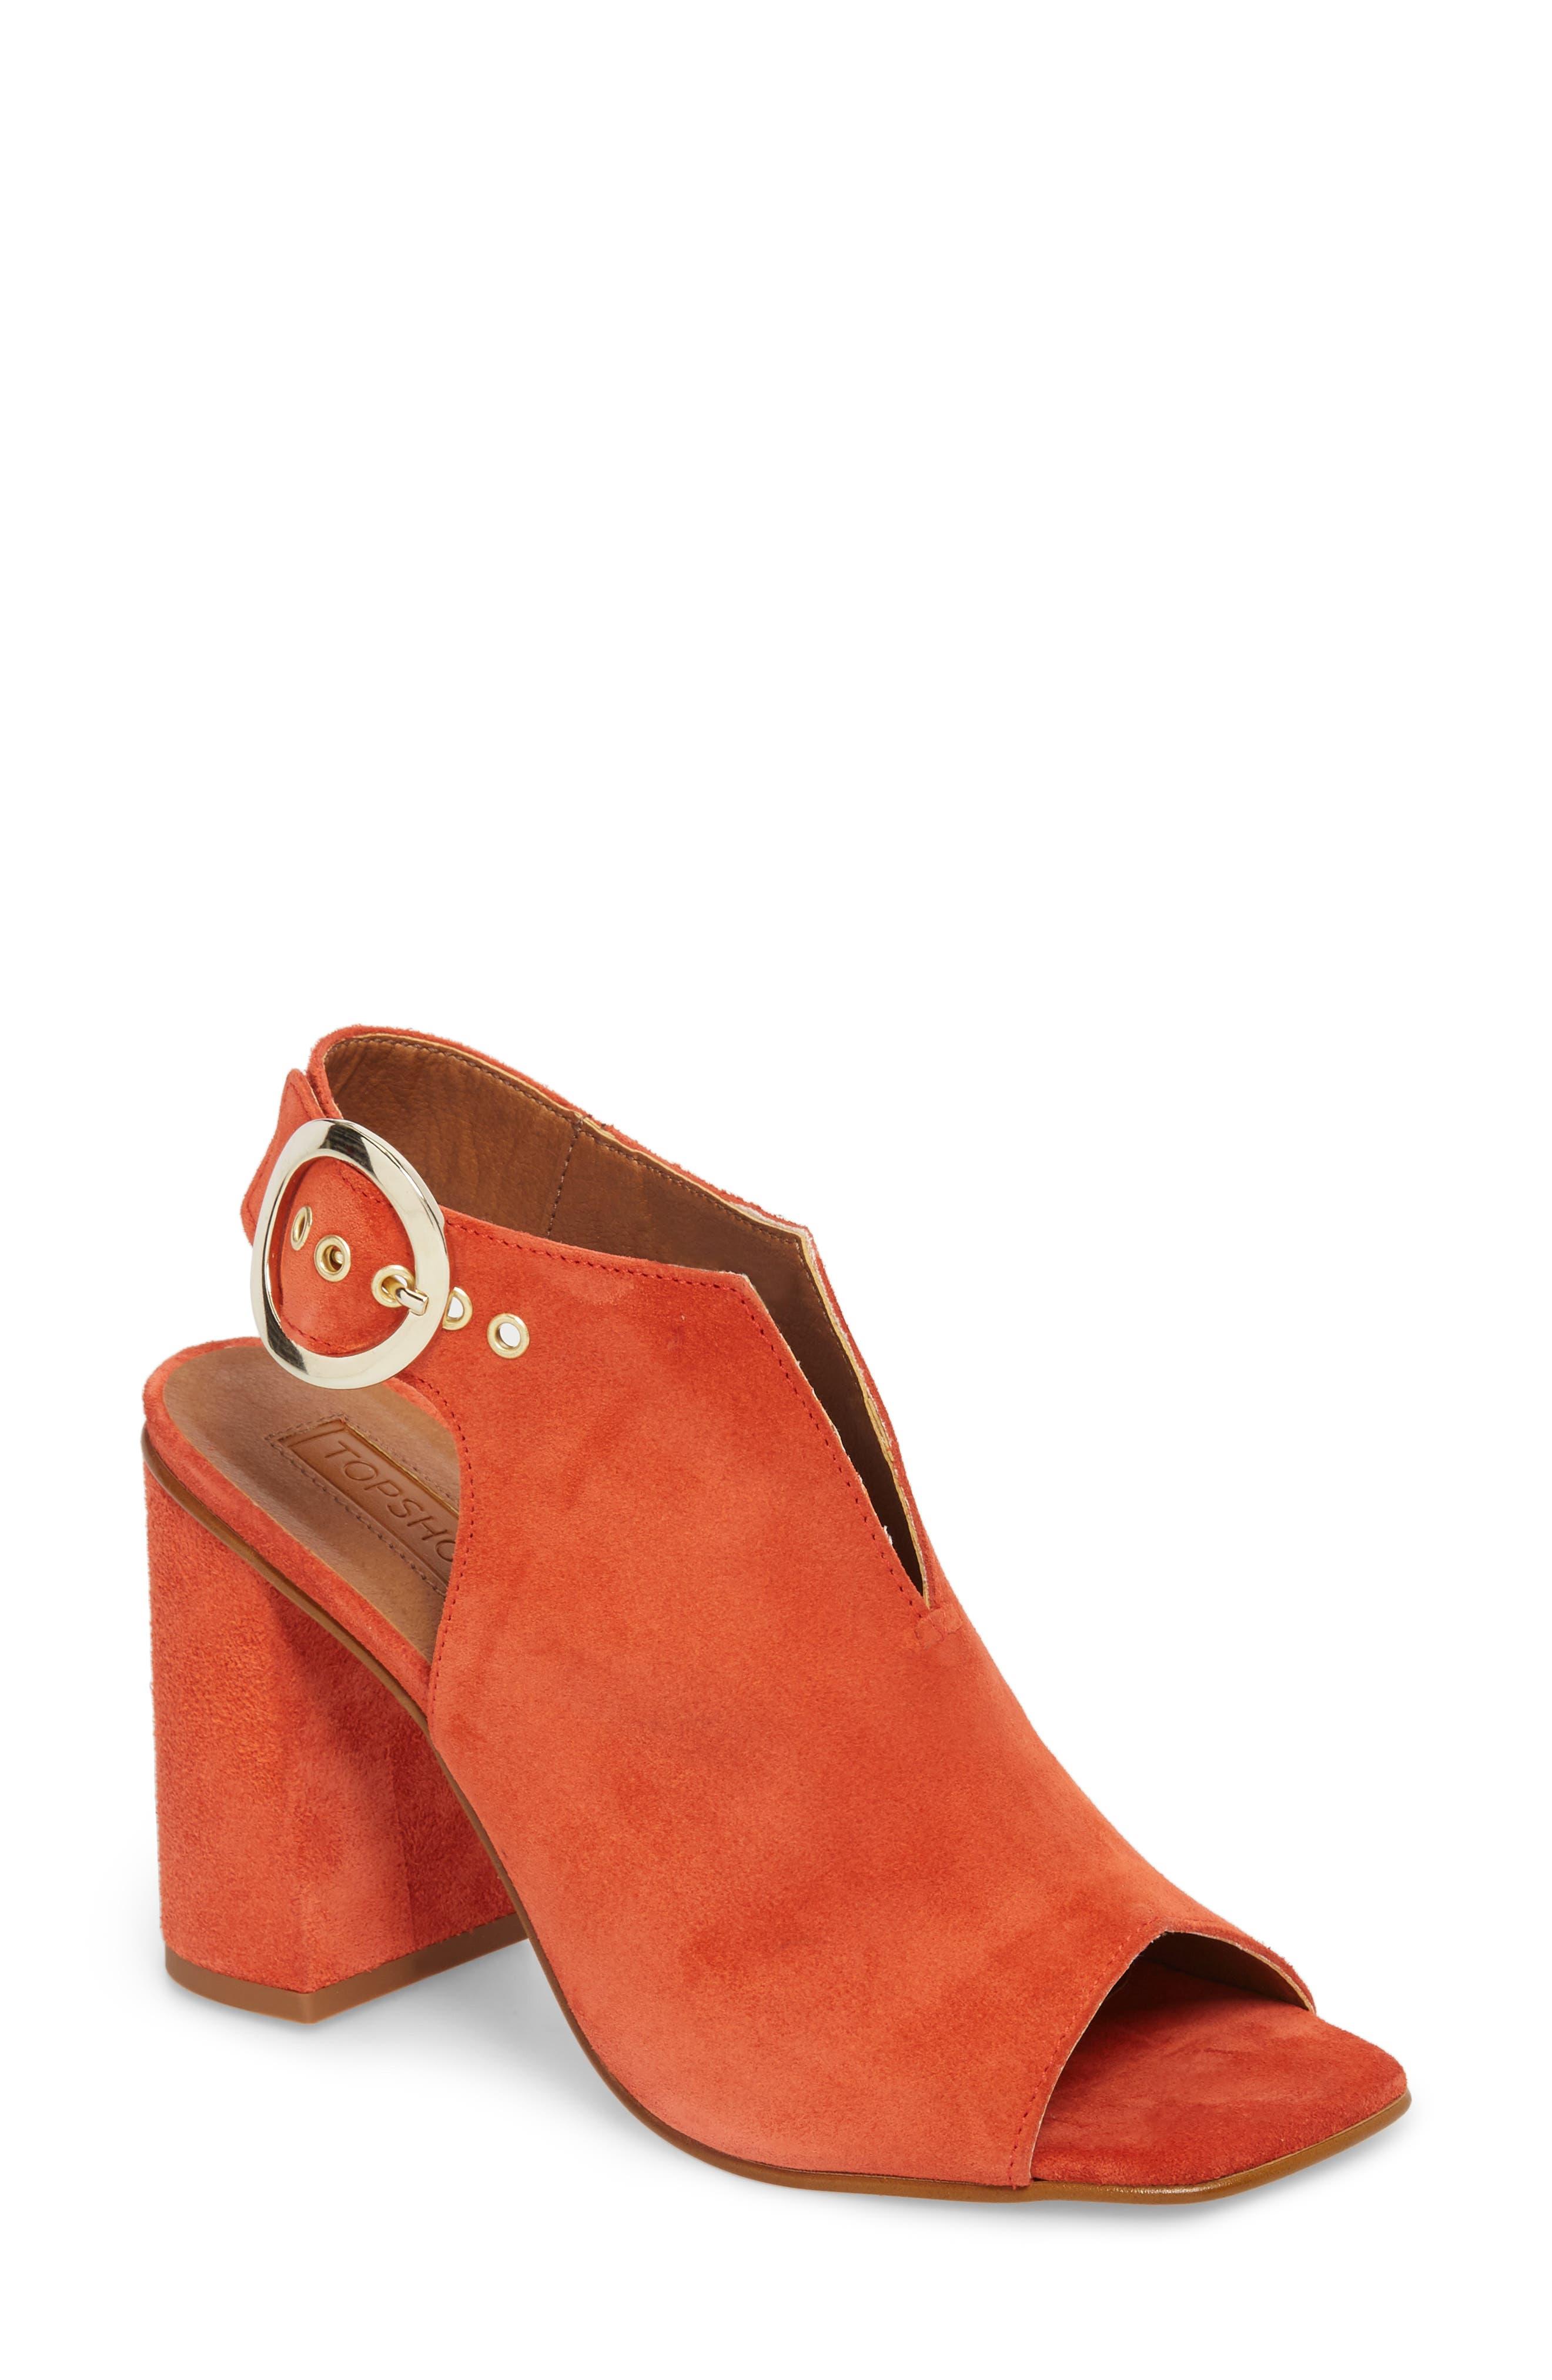 Nika Flared Heel Slingback Sandal,                         Main,                         color, Orange